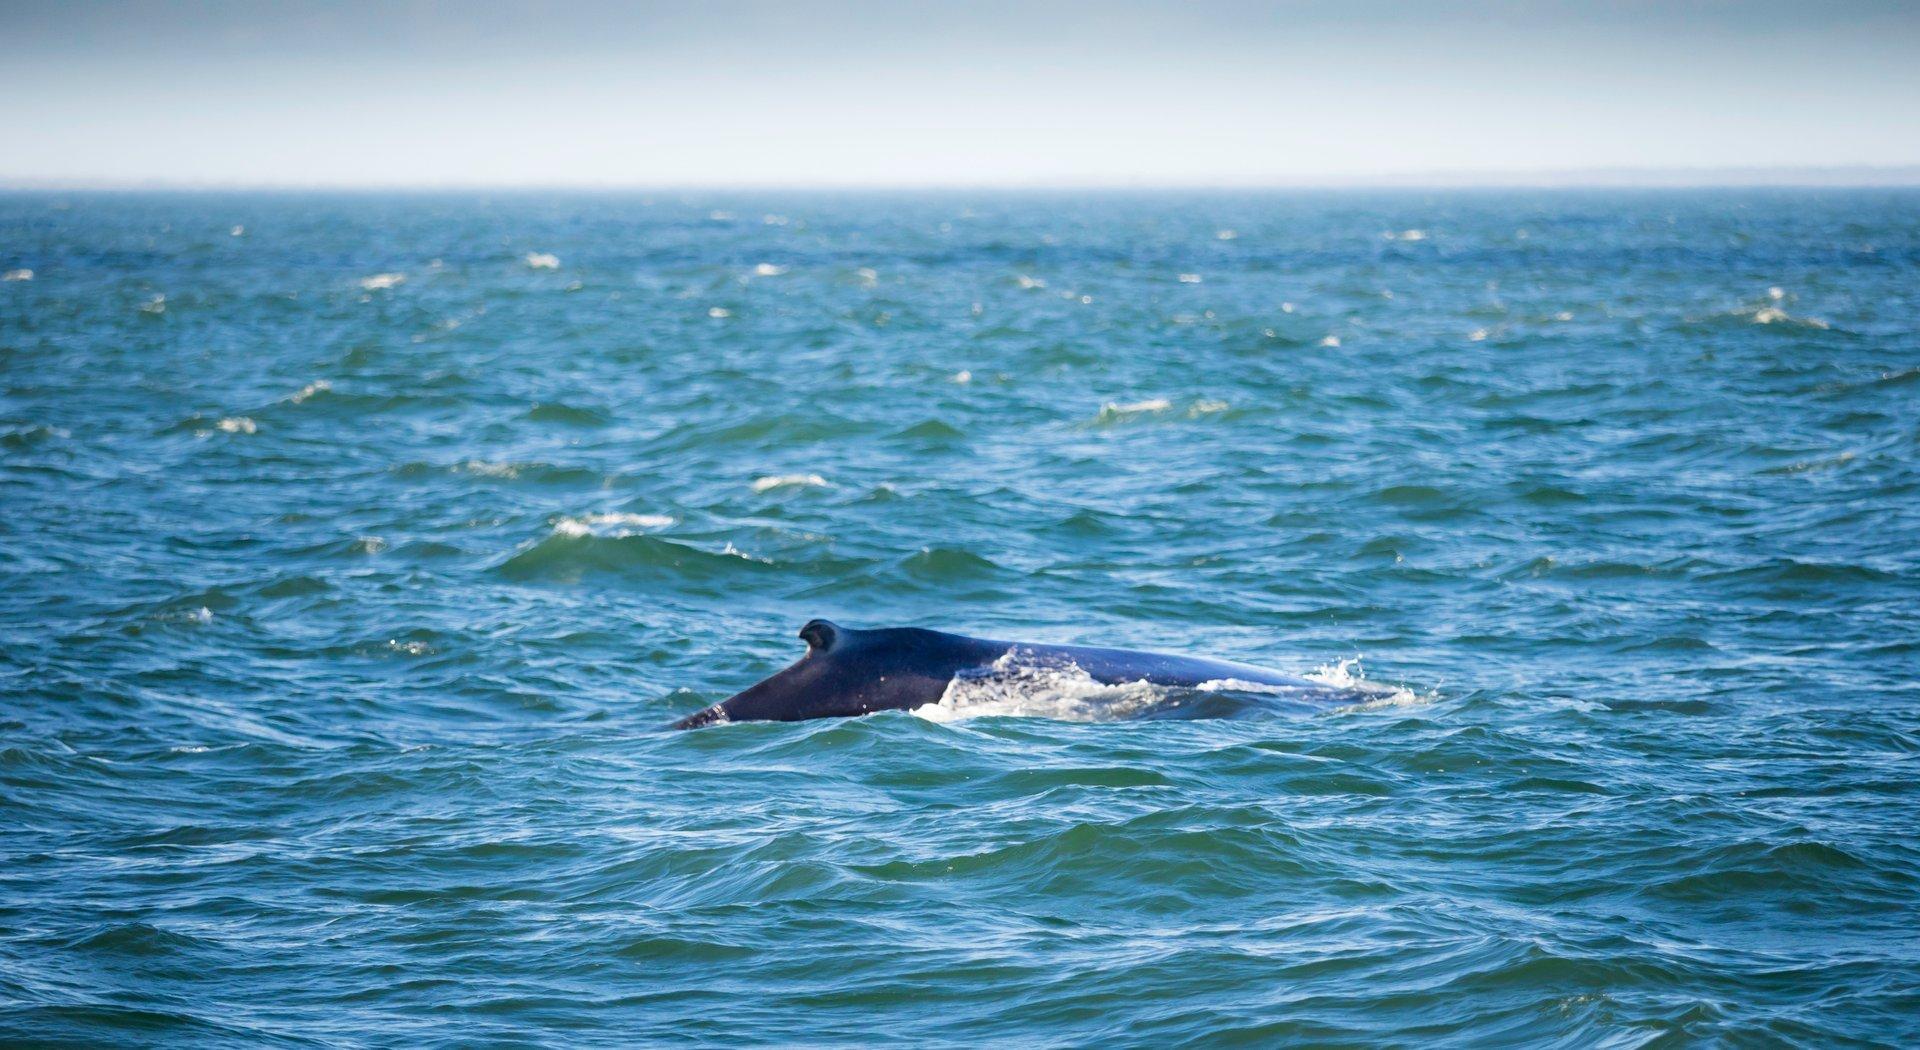 Humpback whales 2020